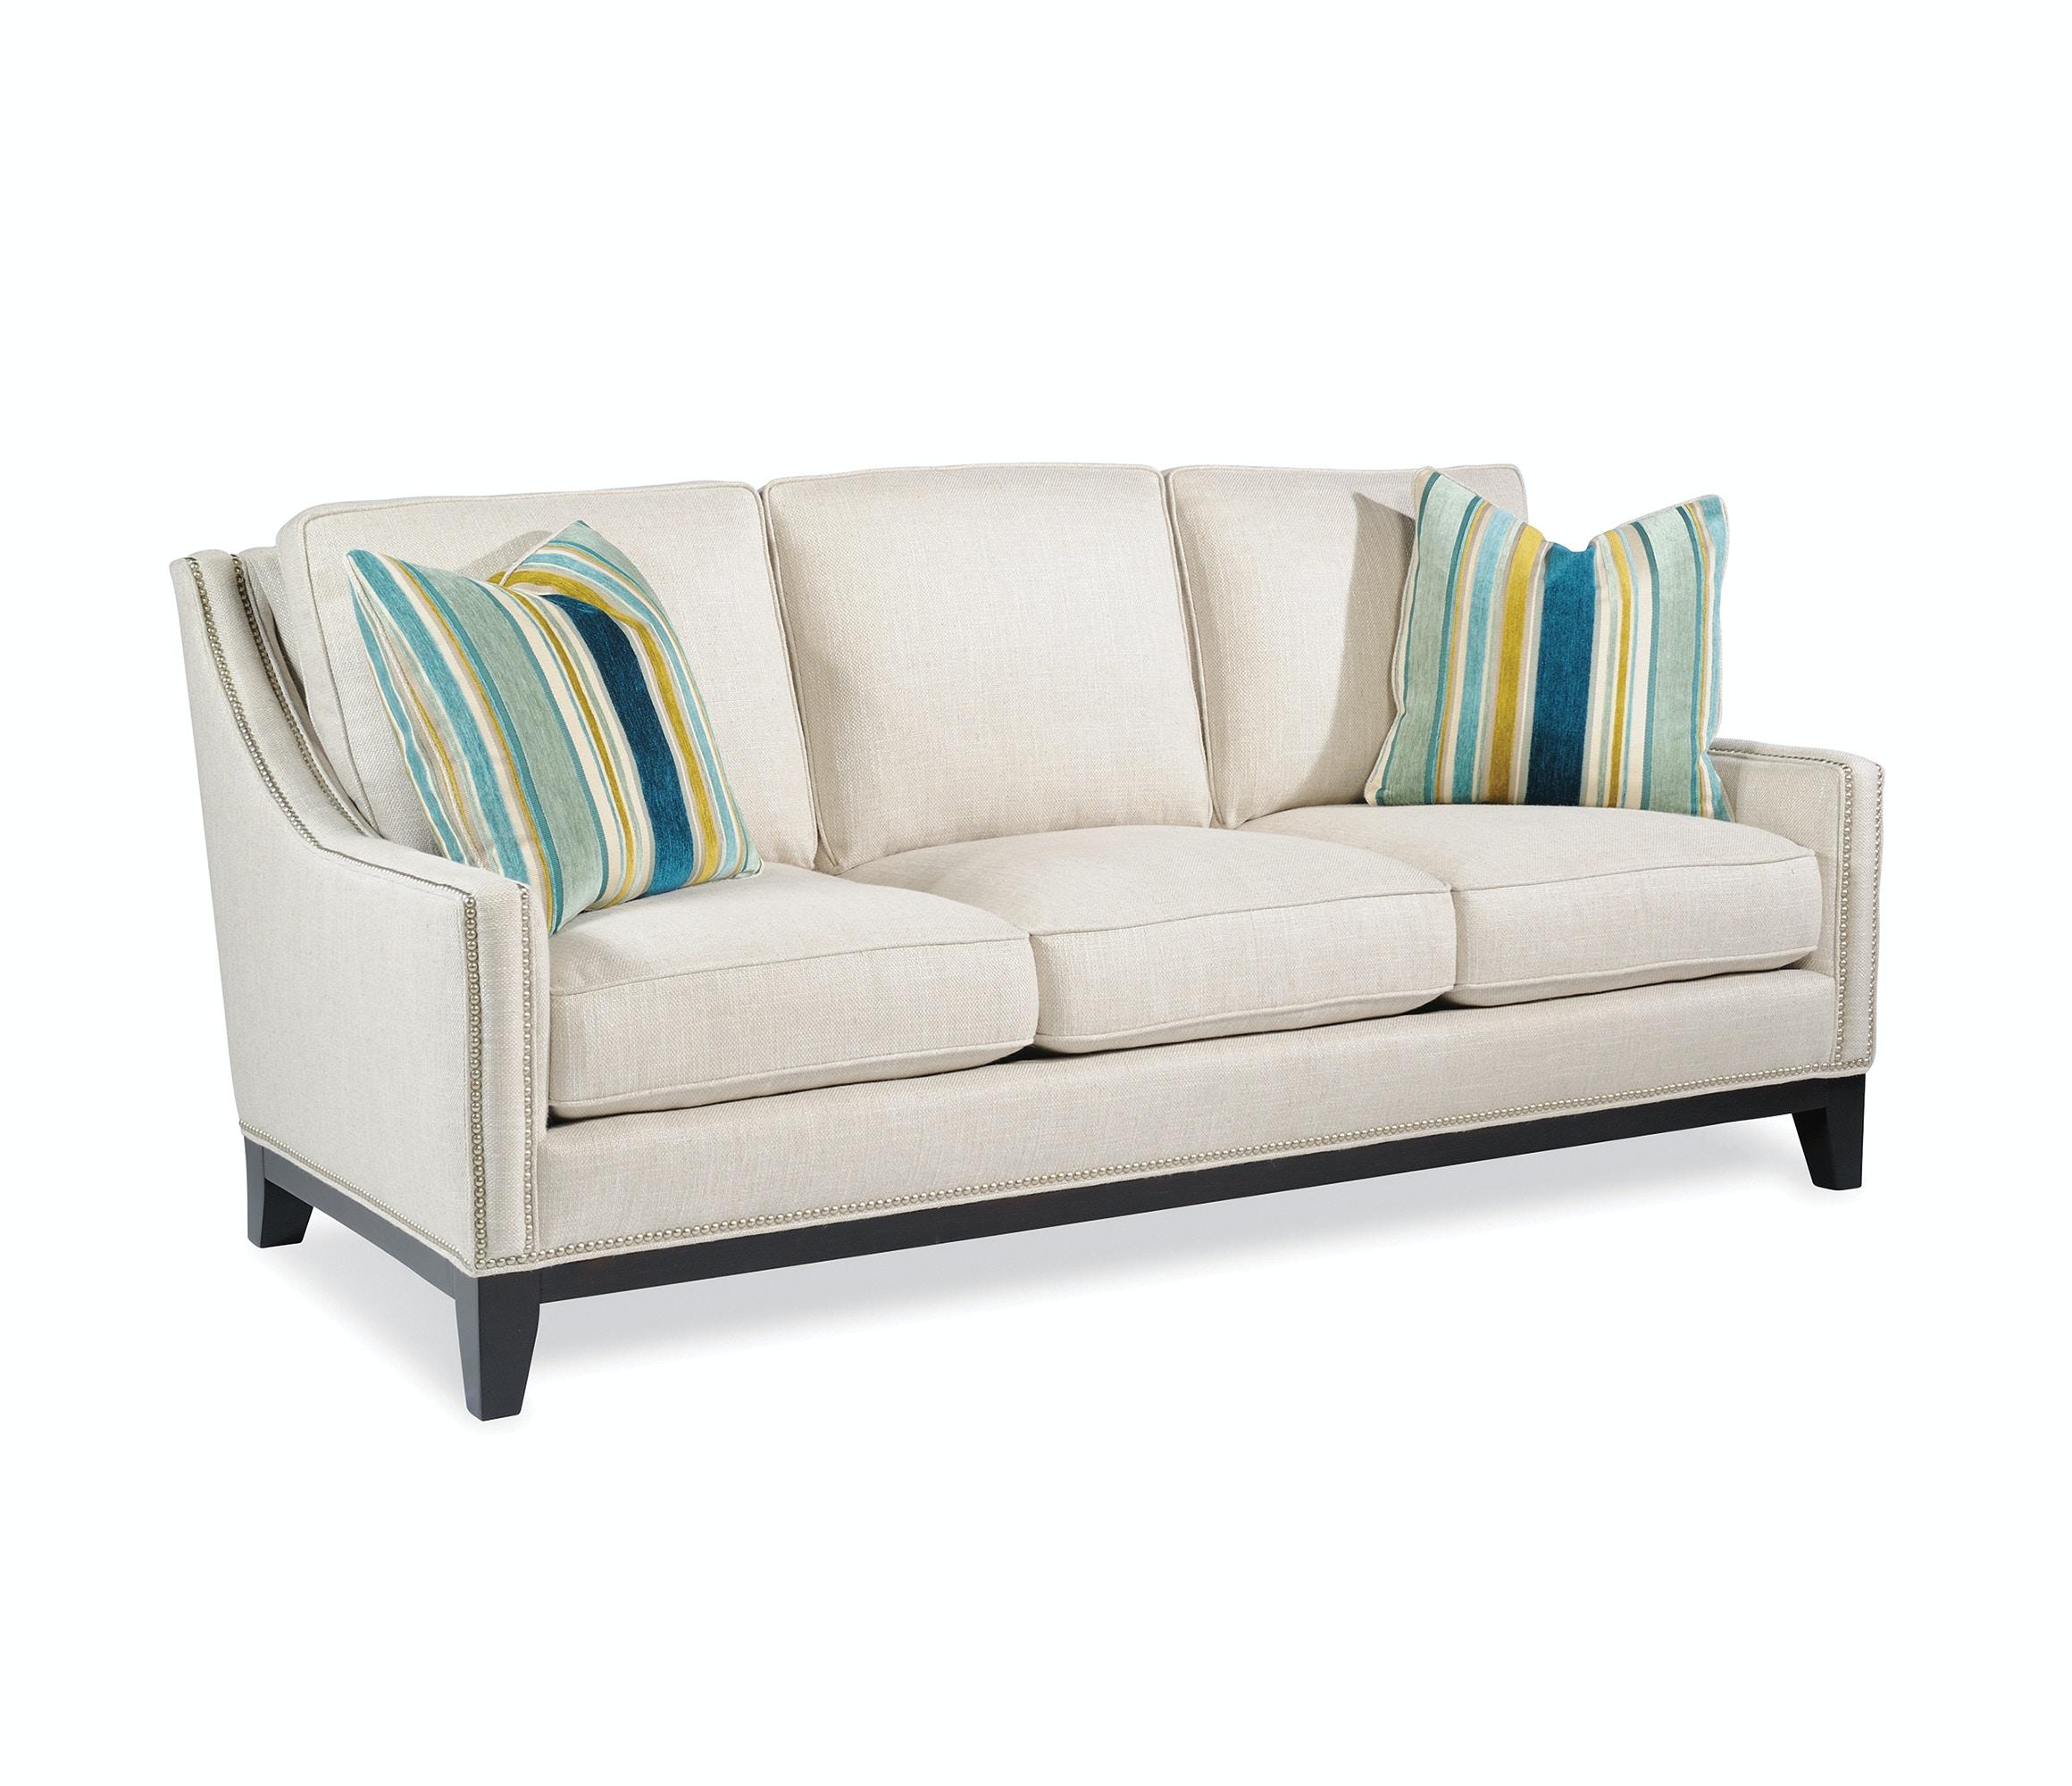 Taylor King Furniture Giles Sofa K6013